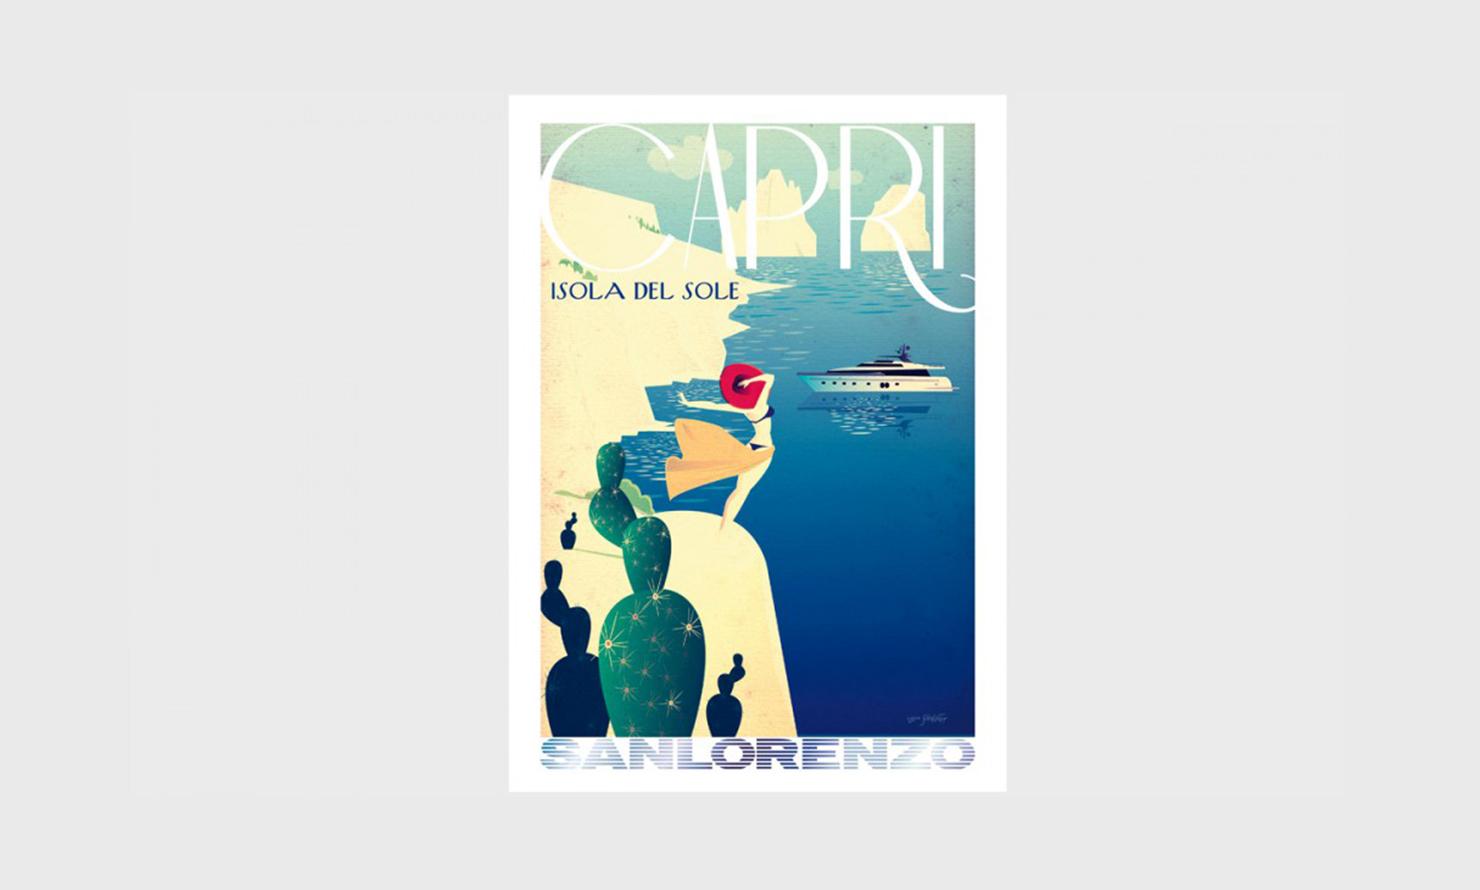 https://kubelibre.com/uploads/Slider-work-tutti-clienti/sanlorenzo-yacht-made-to-measure-yacht-since-1958-poster-1.jpg